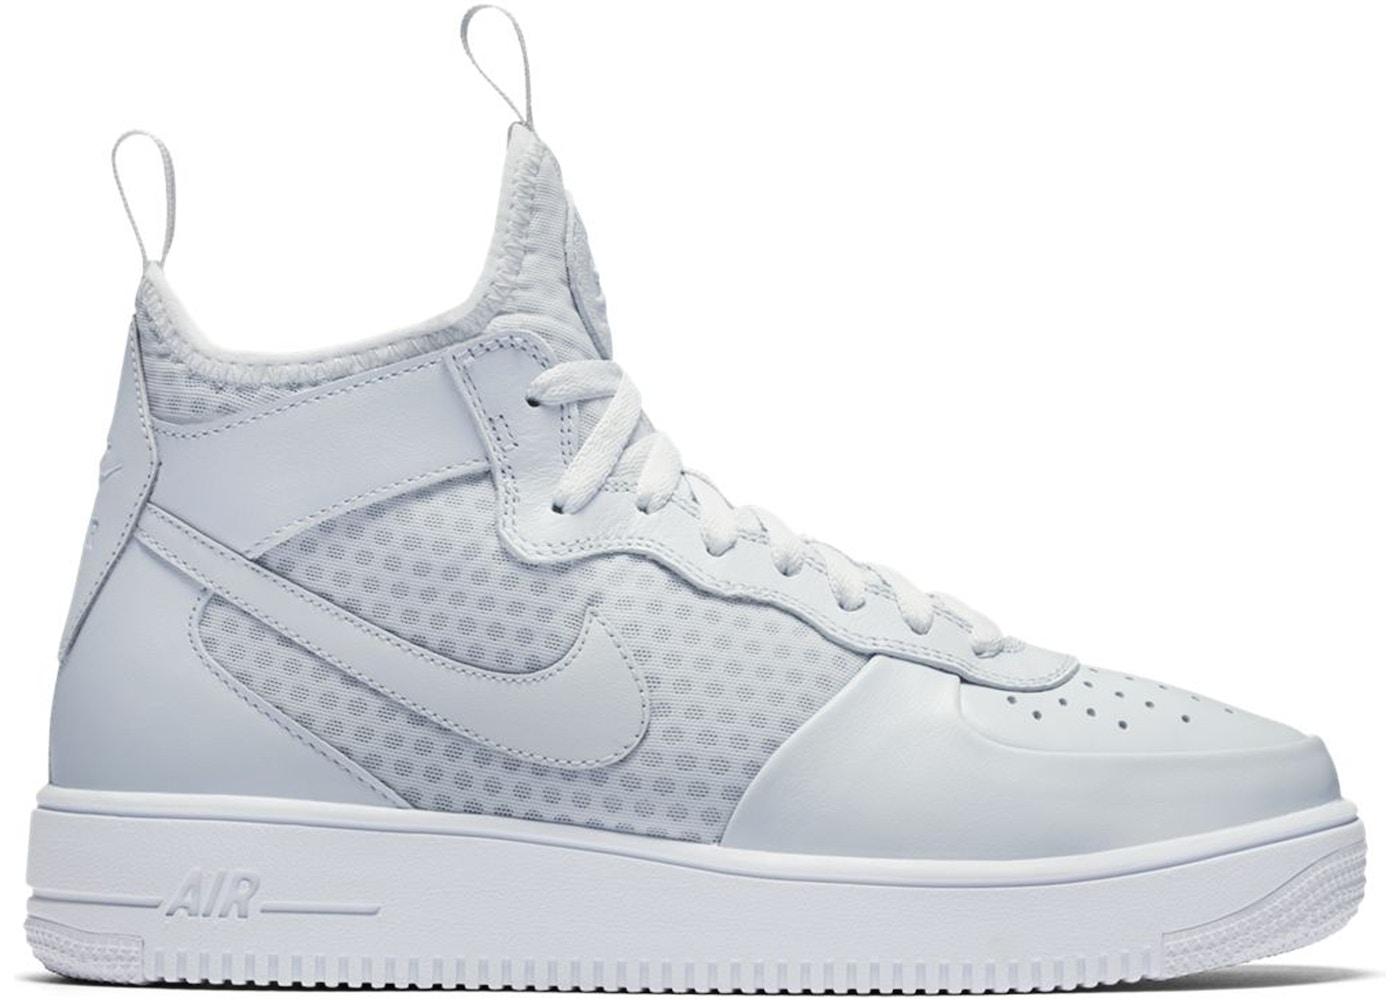 Nike Air Force 1 Ultraforce Mid Pure Platinum